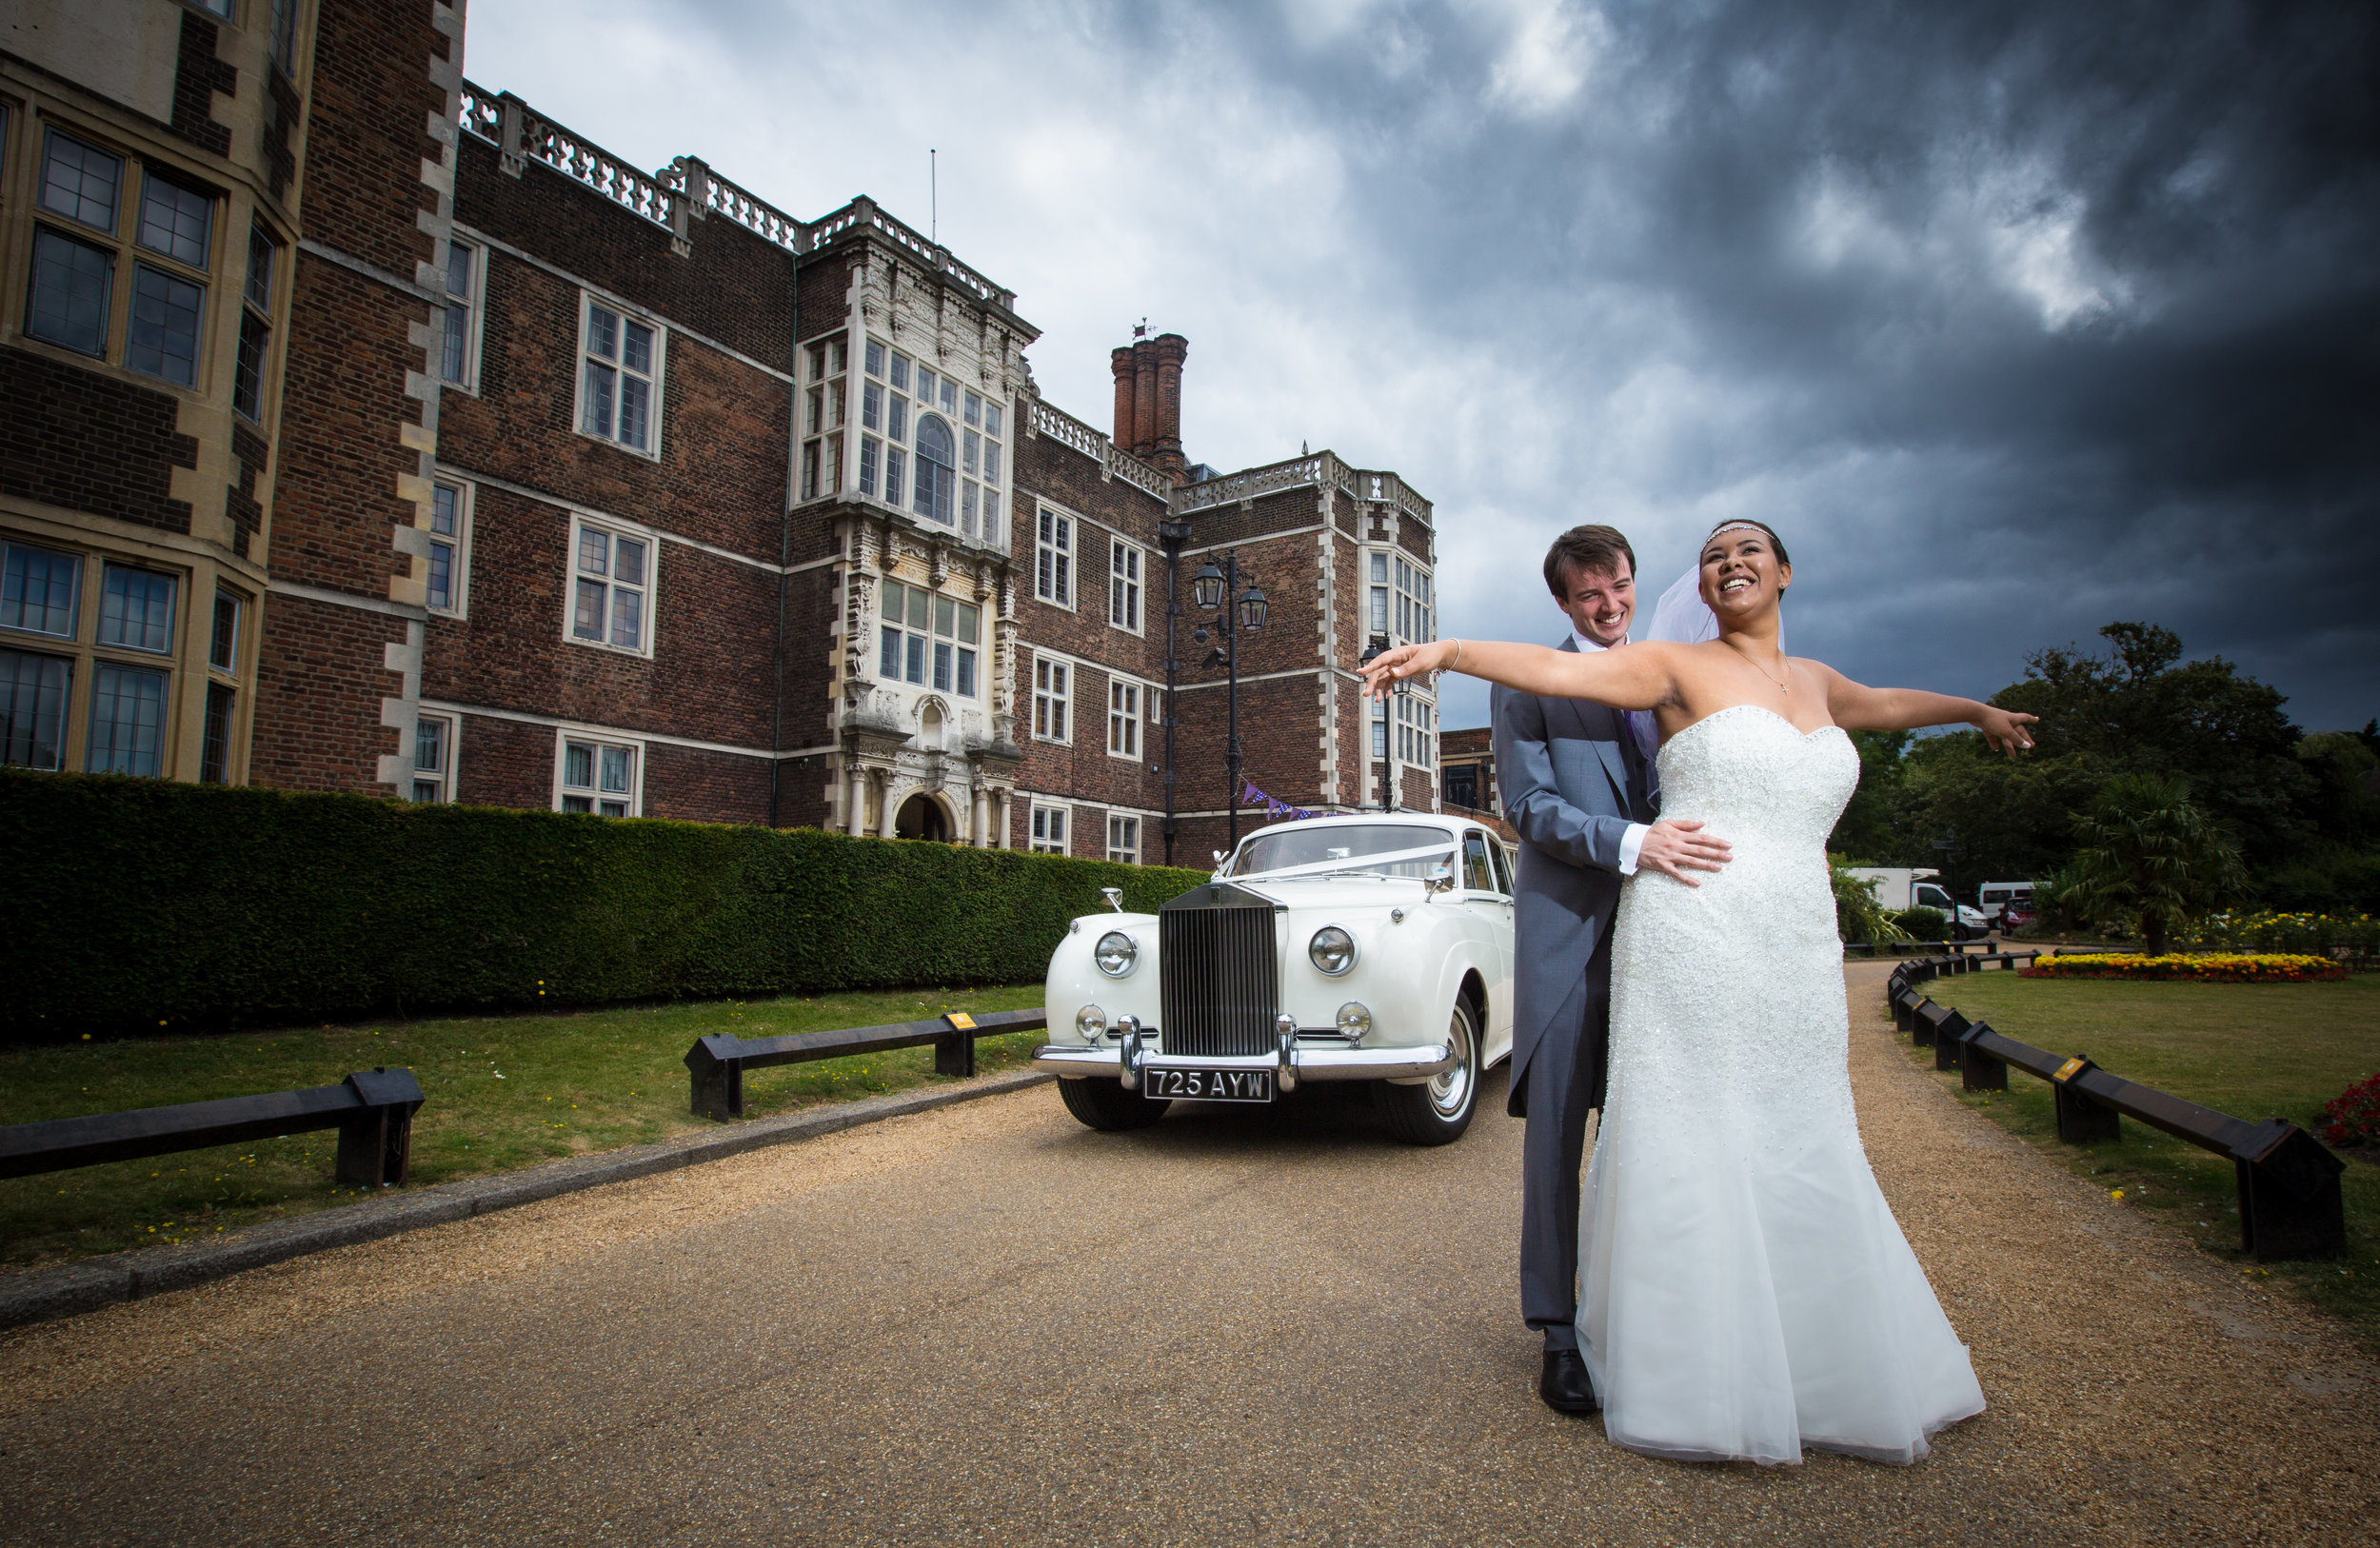 Saint-Alfege-Church-greenwich-wedding-charlton-house-london-rolls-royce-195